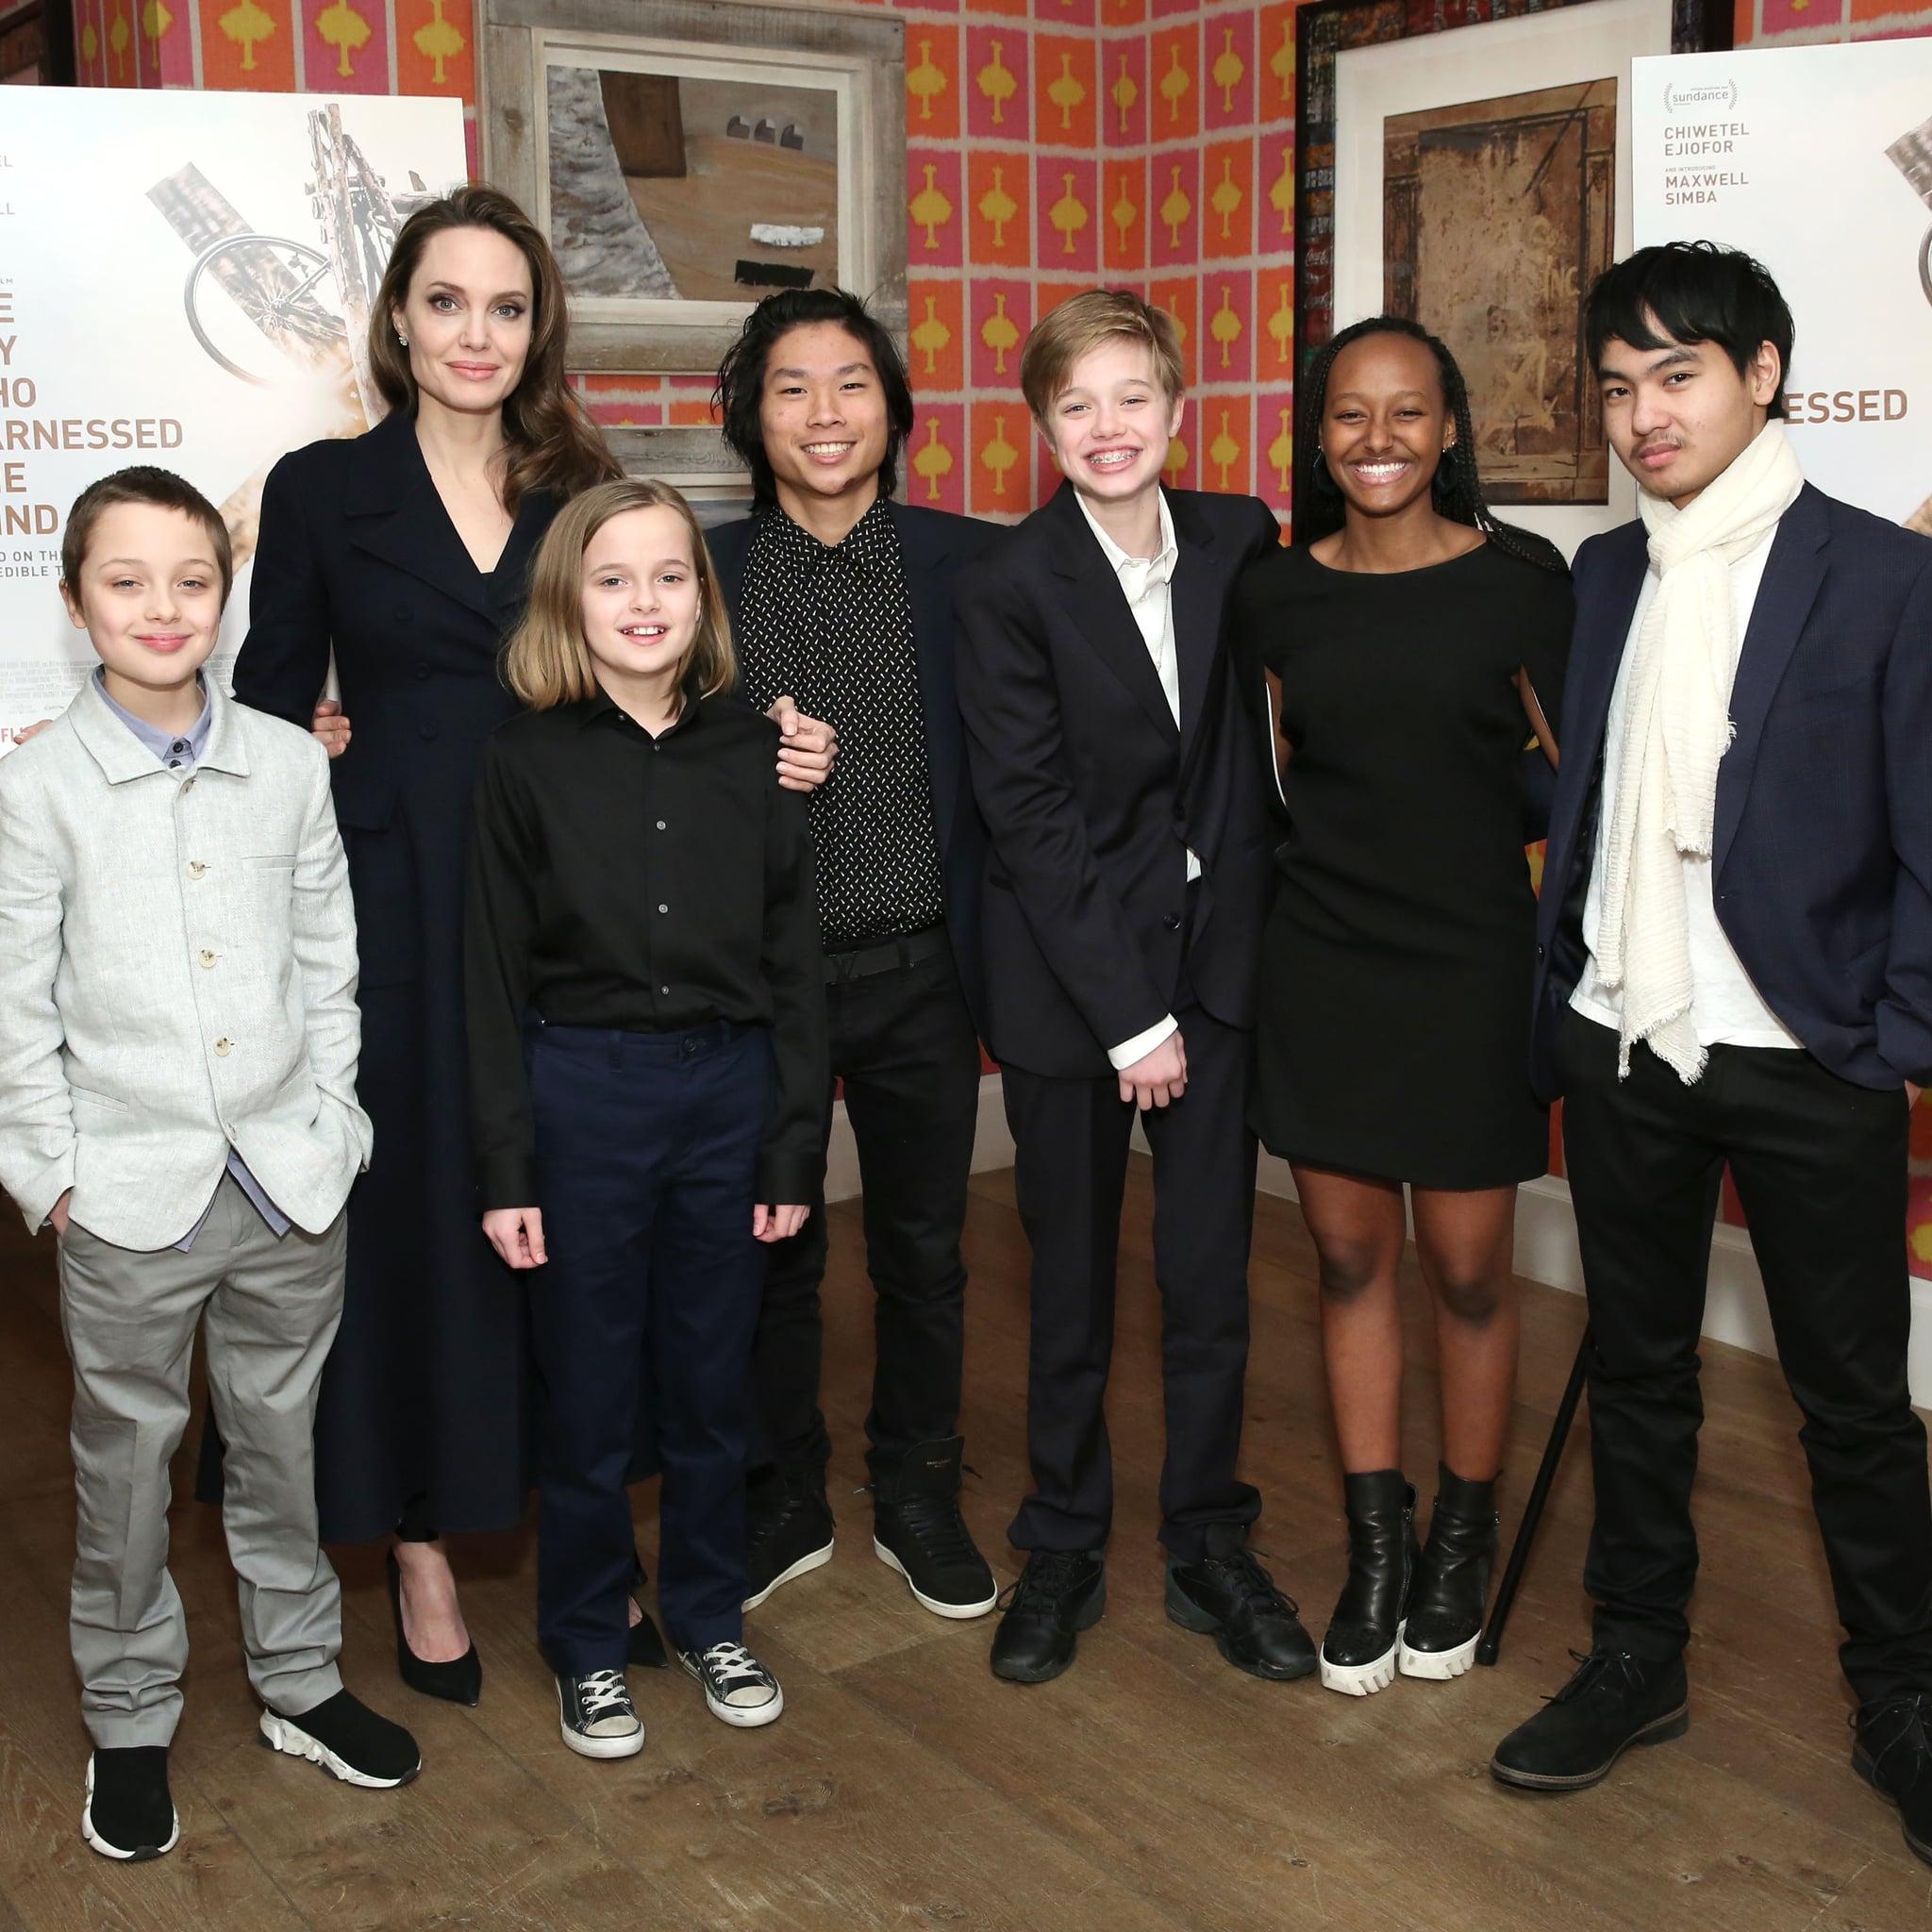 How Many Kids Do Angelina Jolie and Brad Pitt Have? | POPSUGAR Family